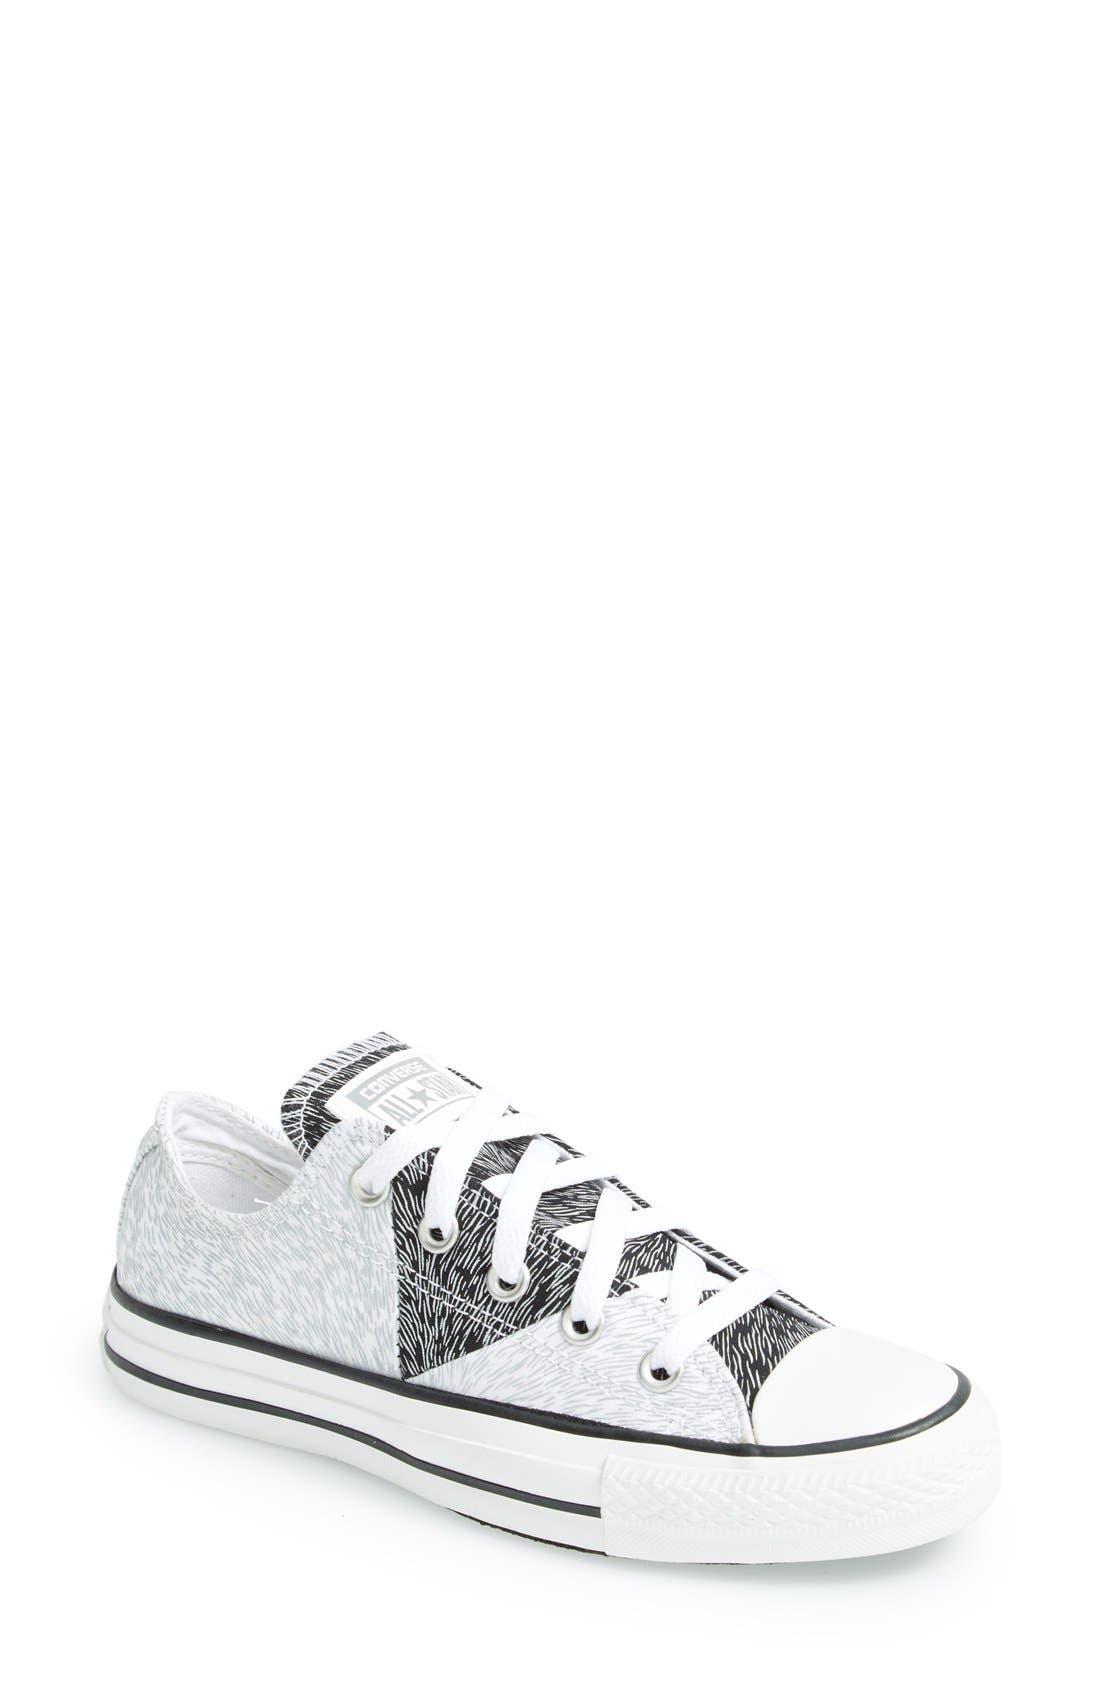 Main Image - Converse Chuck Taylor® All Star® 'Animal Reflect' Sneaker (Women)